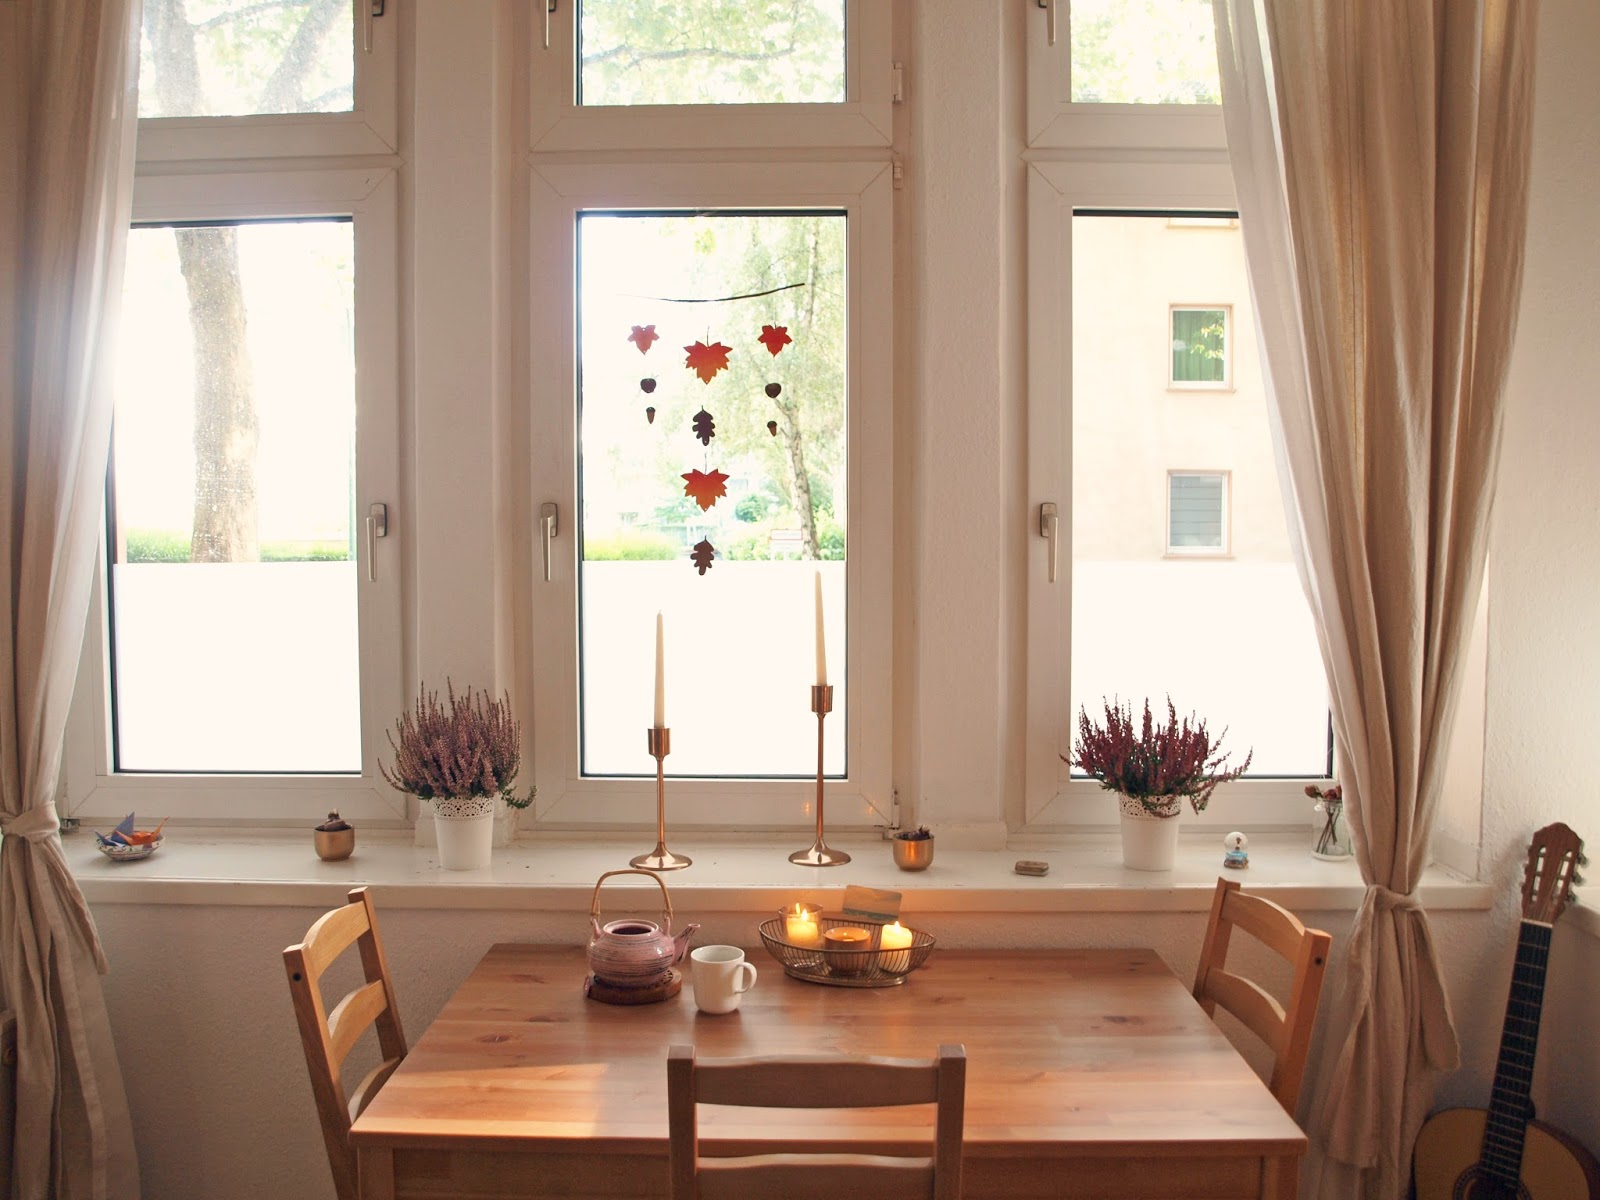 diy deko herbst deko mobile aus selbstgebasteltem laub. Black Bedroom Furniture Sets. Home Design Ideas